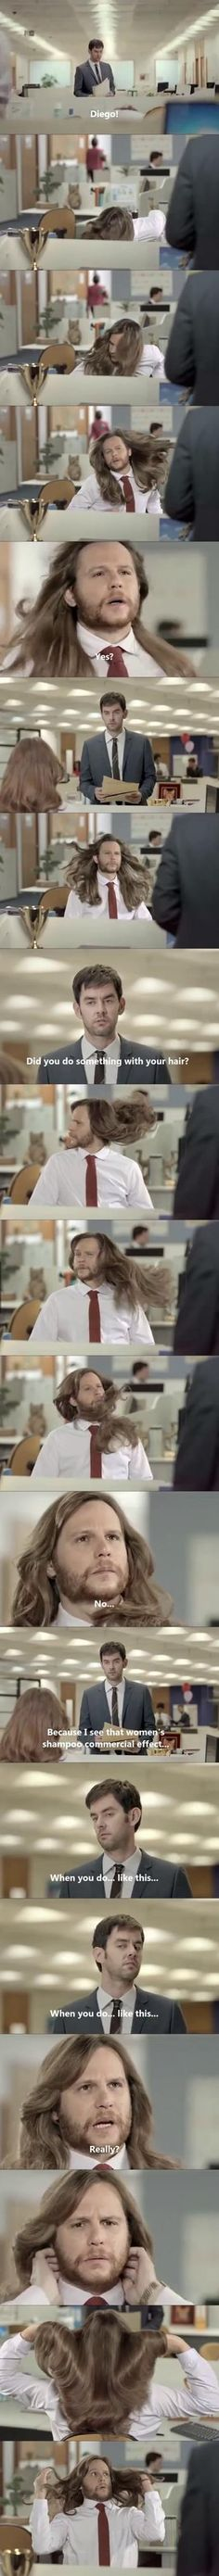 Cuando hombre usan champu de mujer